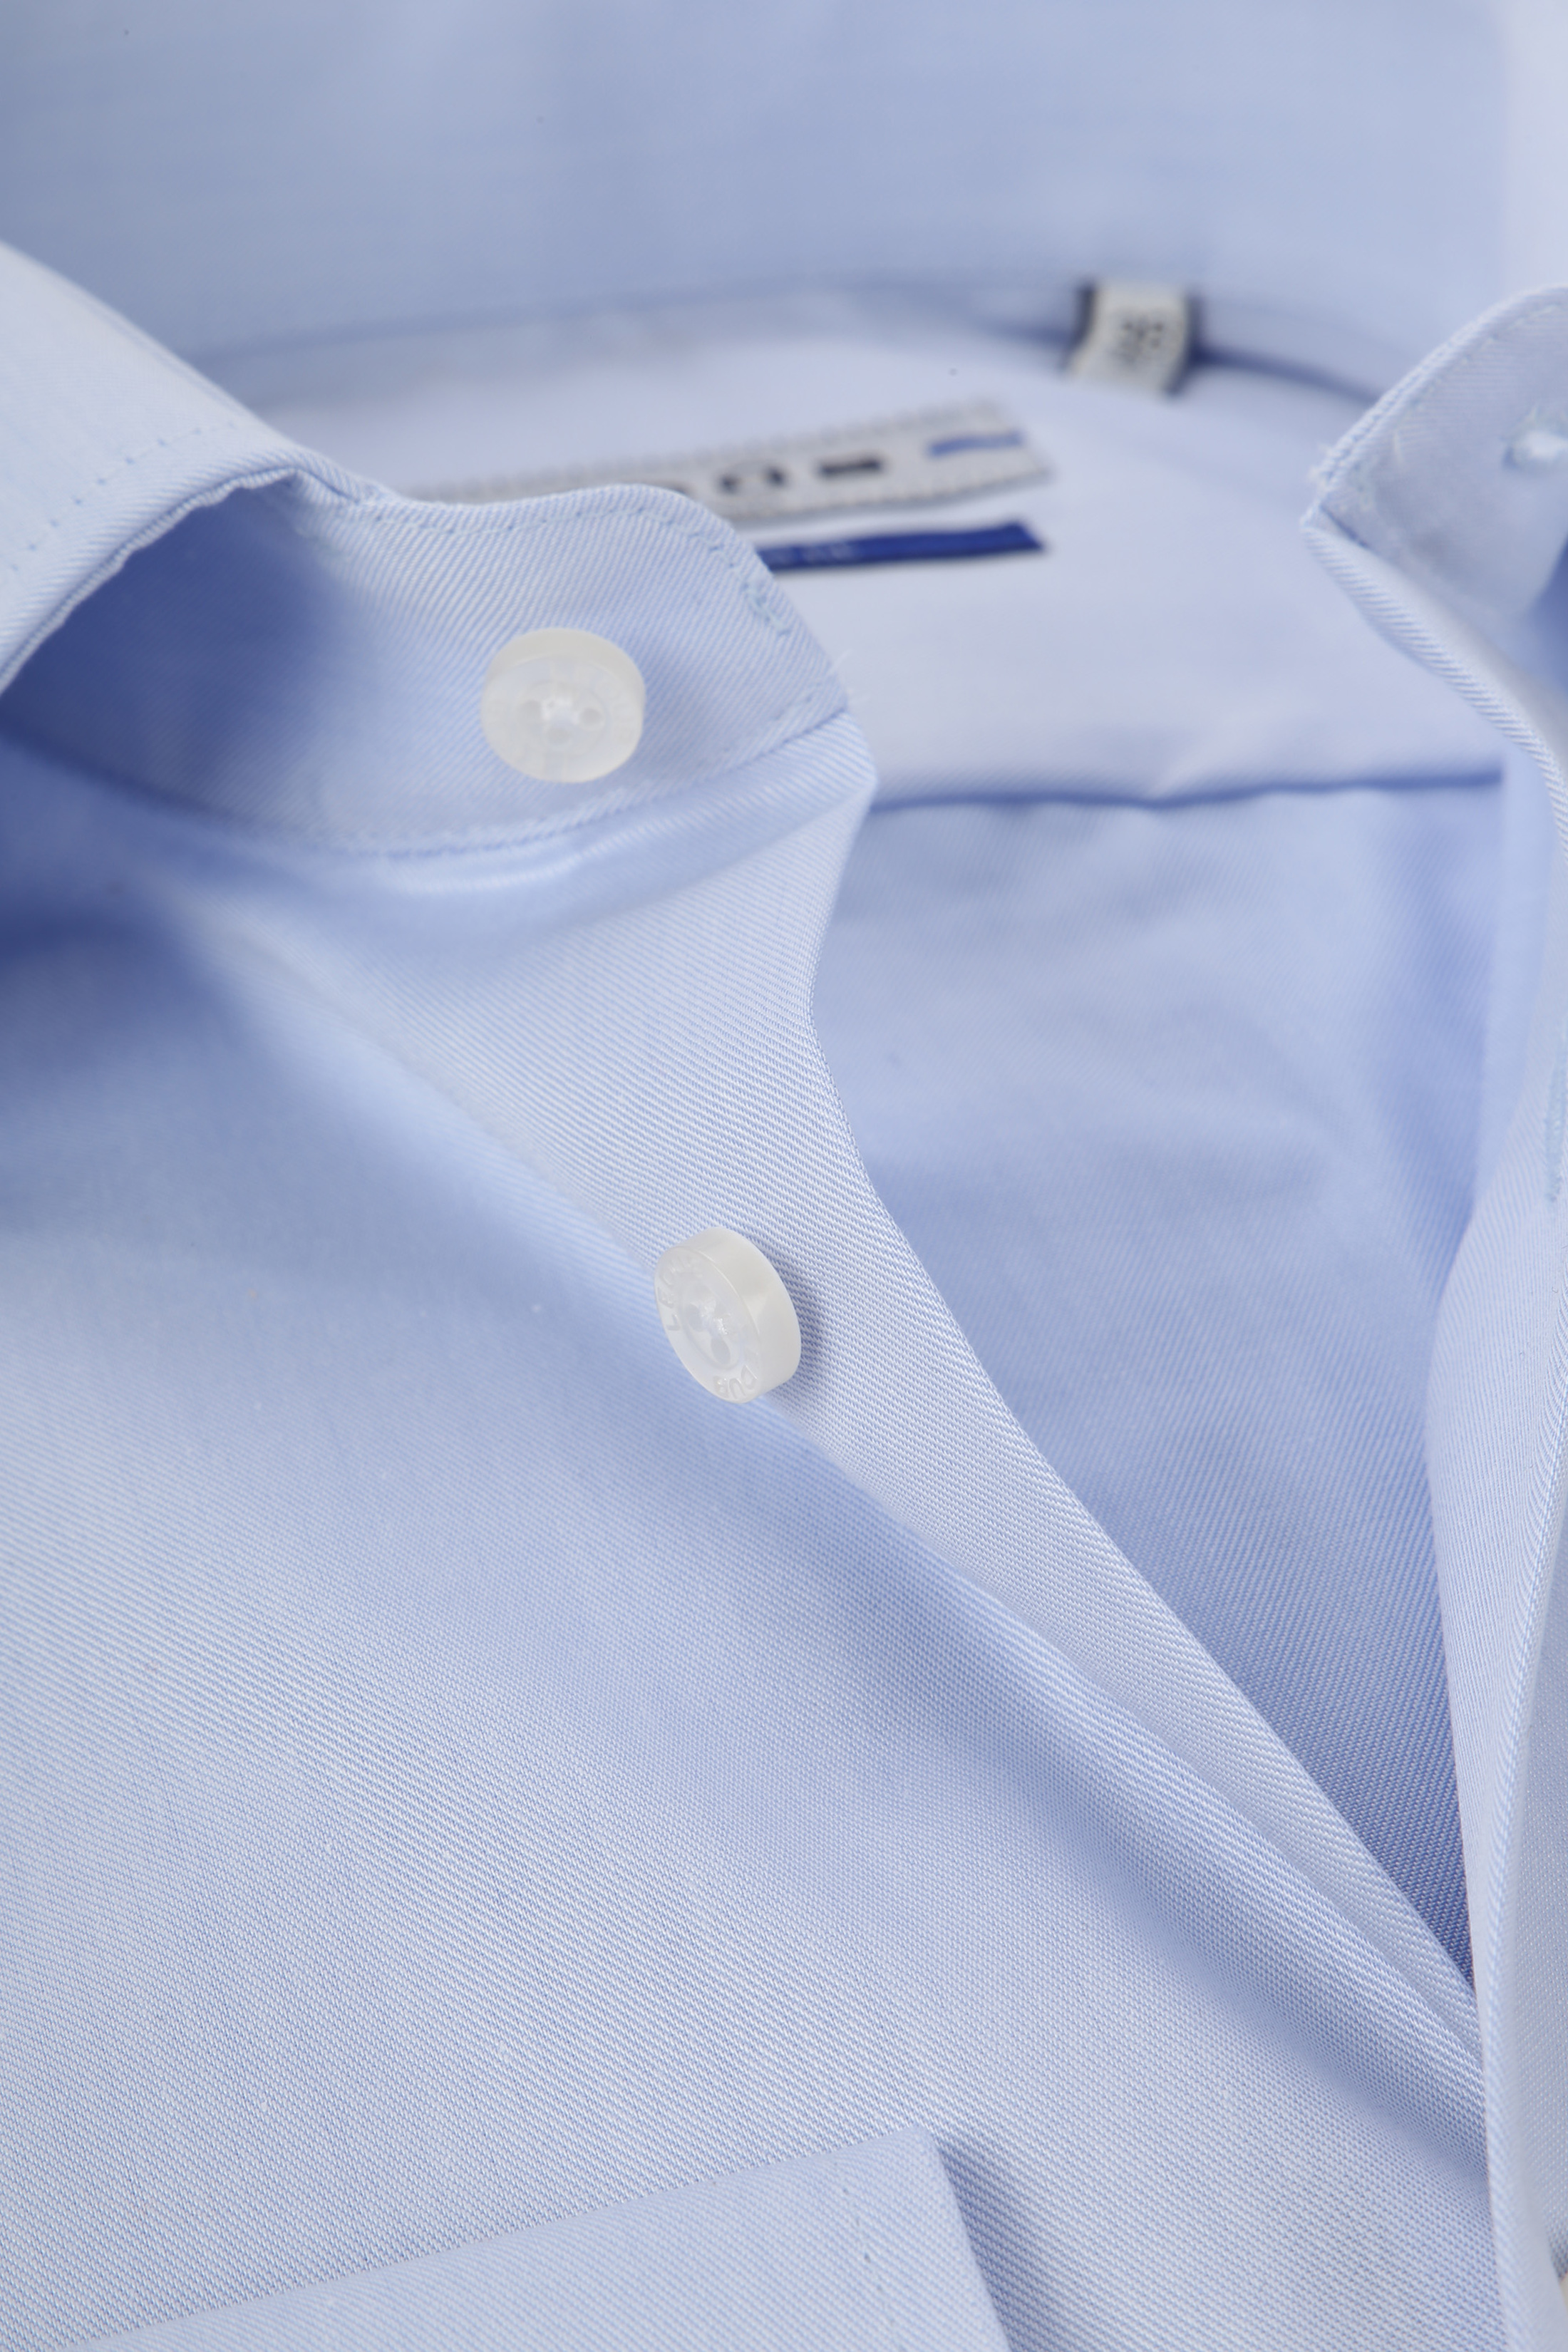 Ledub Strijkvrij Overhemd Blauw Sleeve 7 foto 1